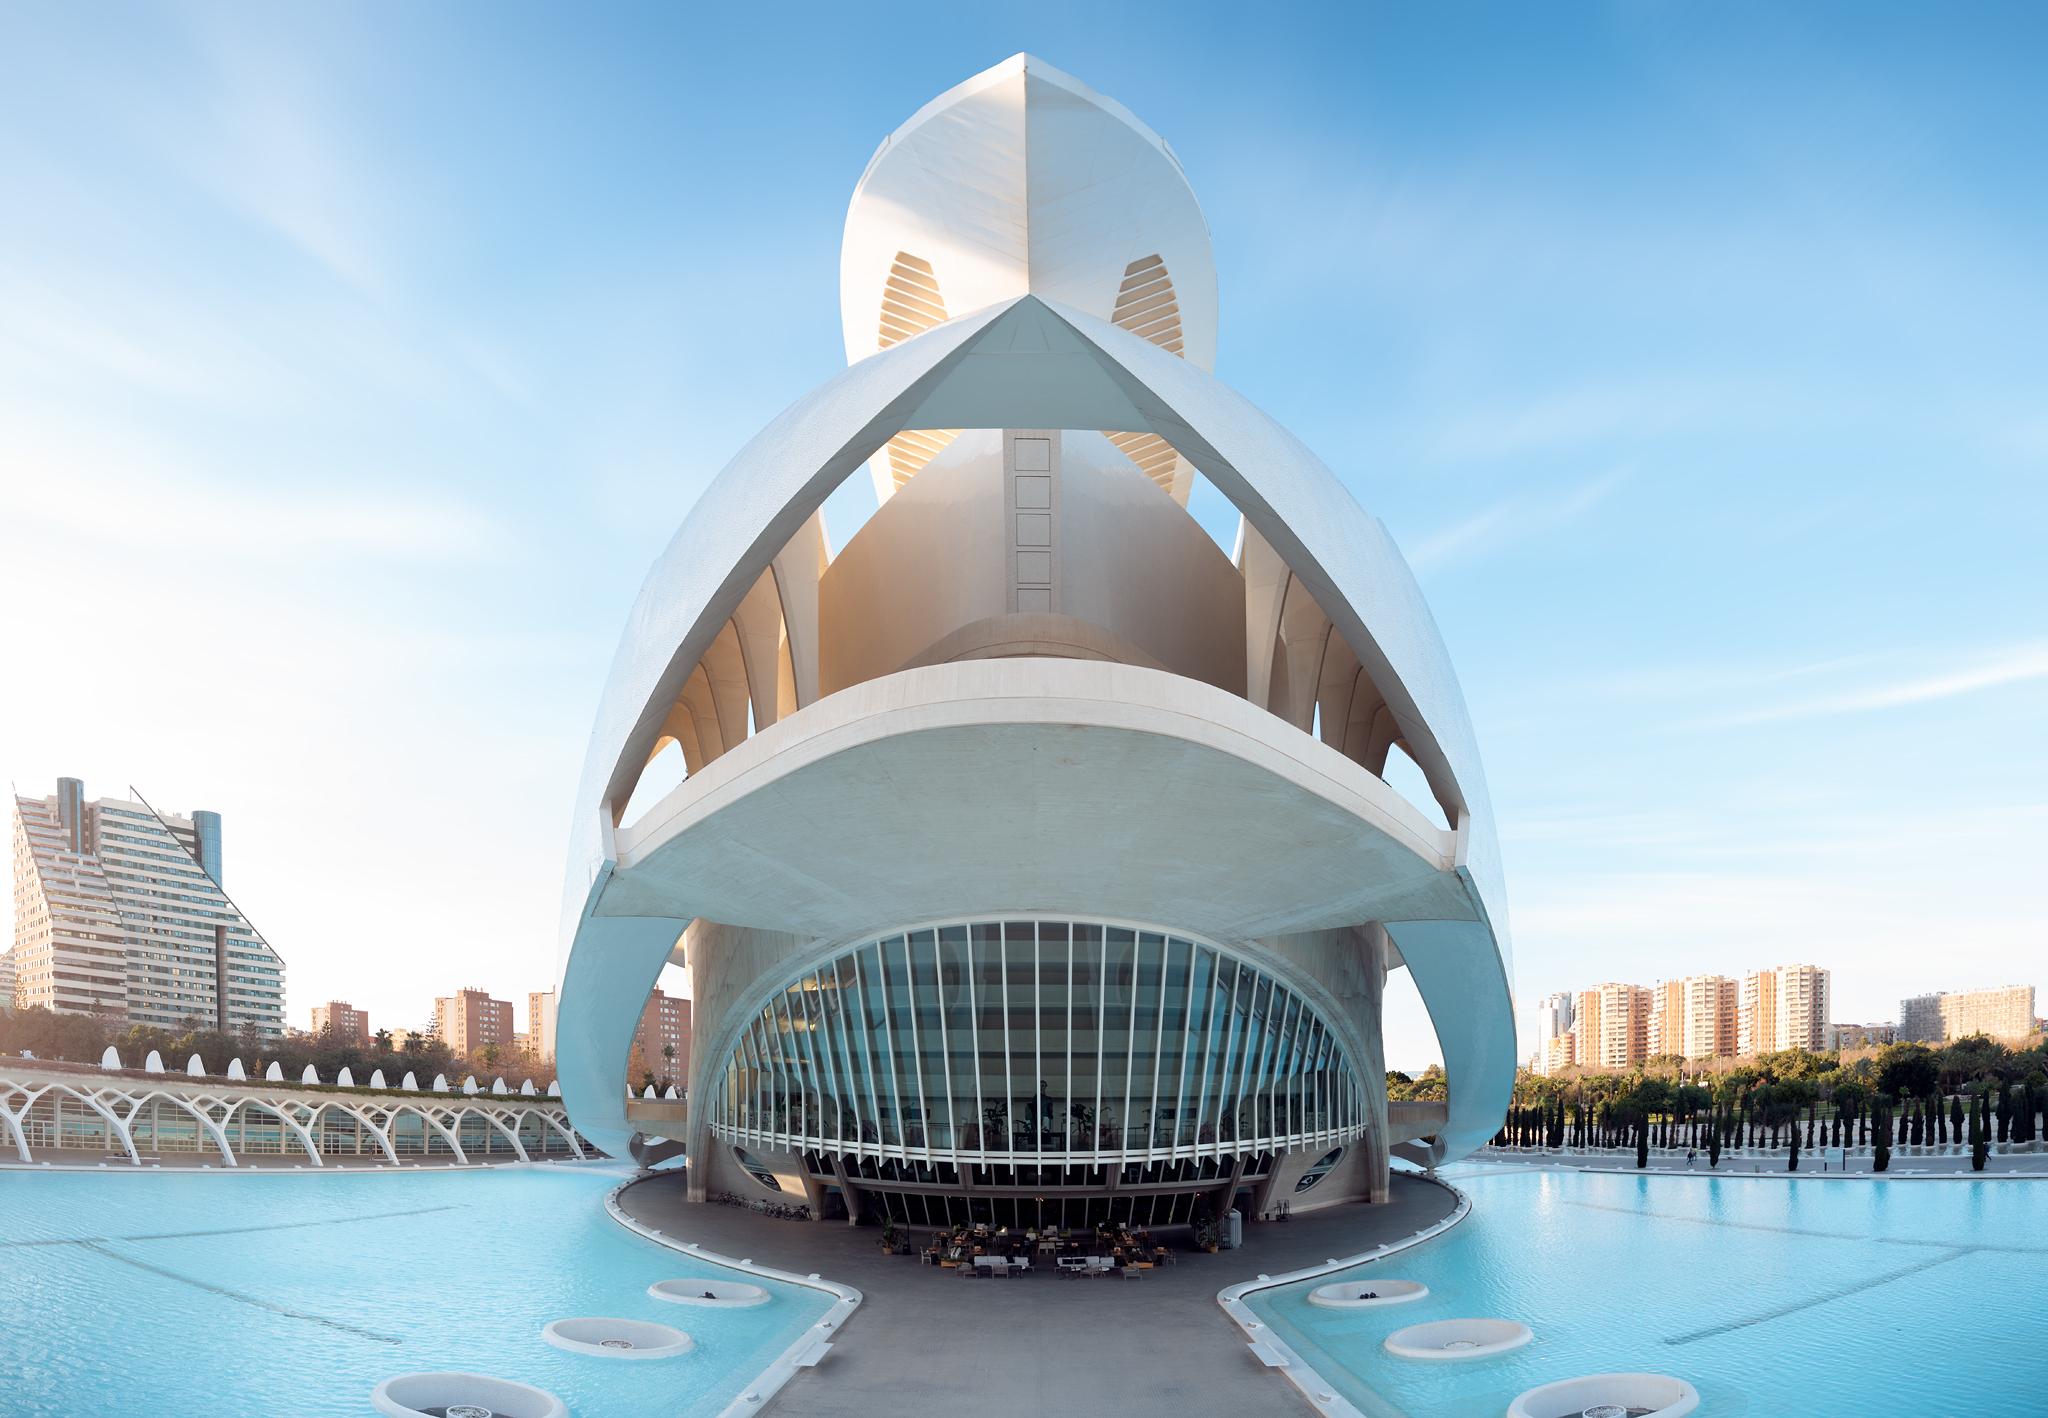 Architekturfotografie Palau de les Arts Reina Sofía, Valencia